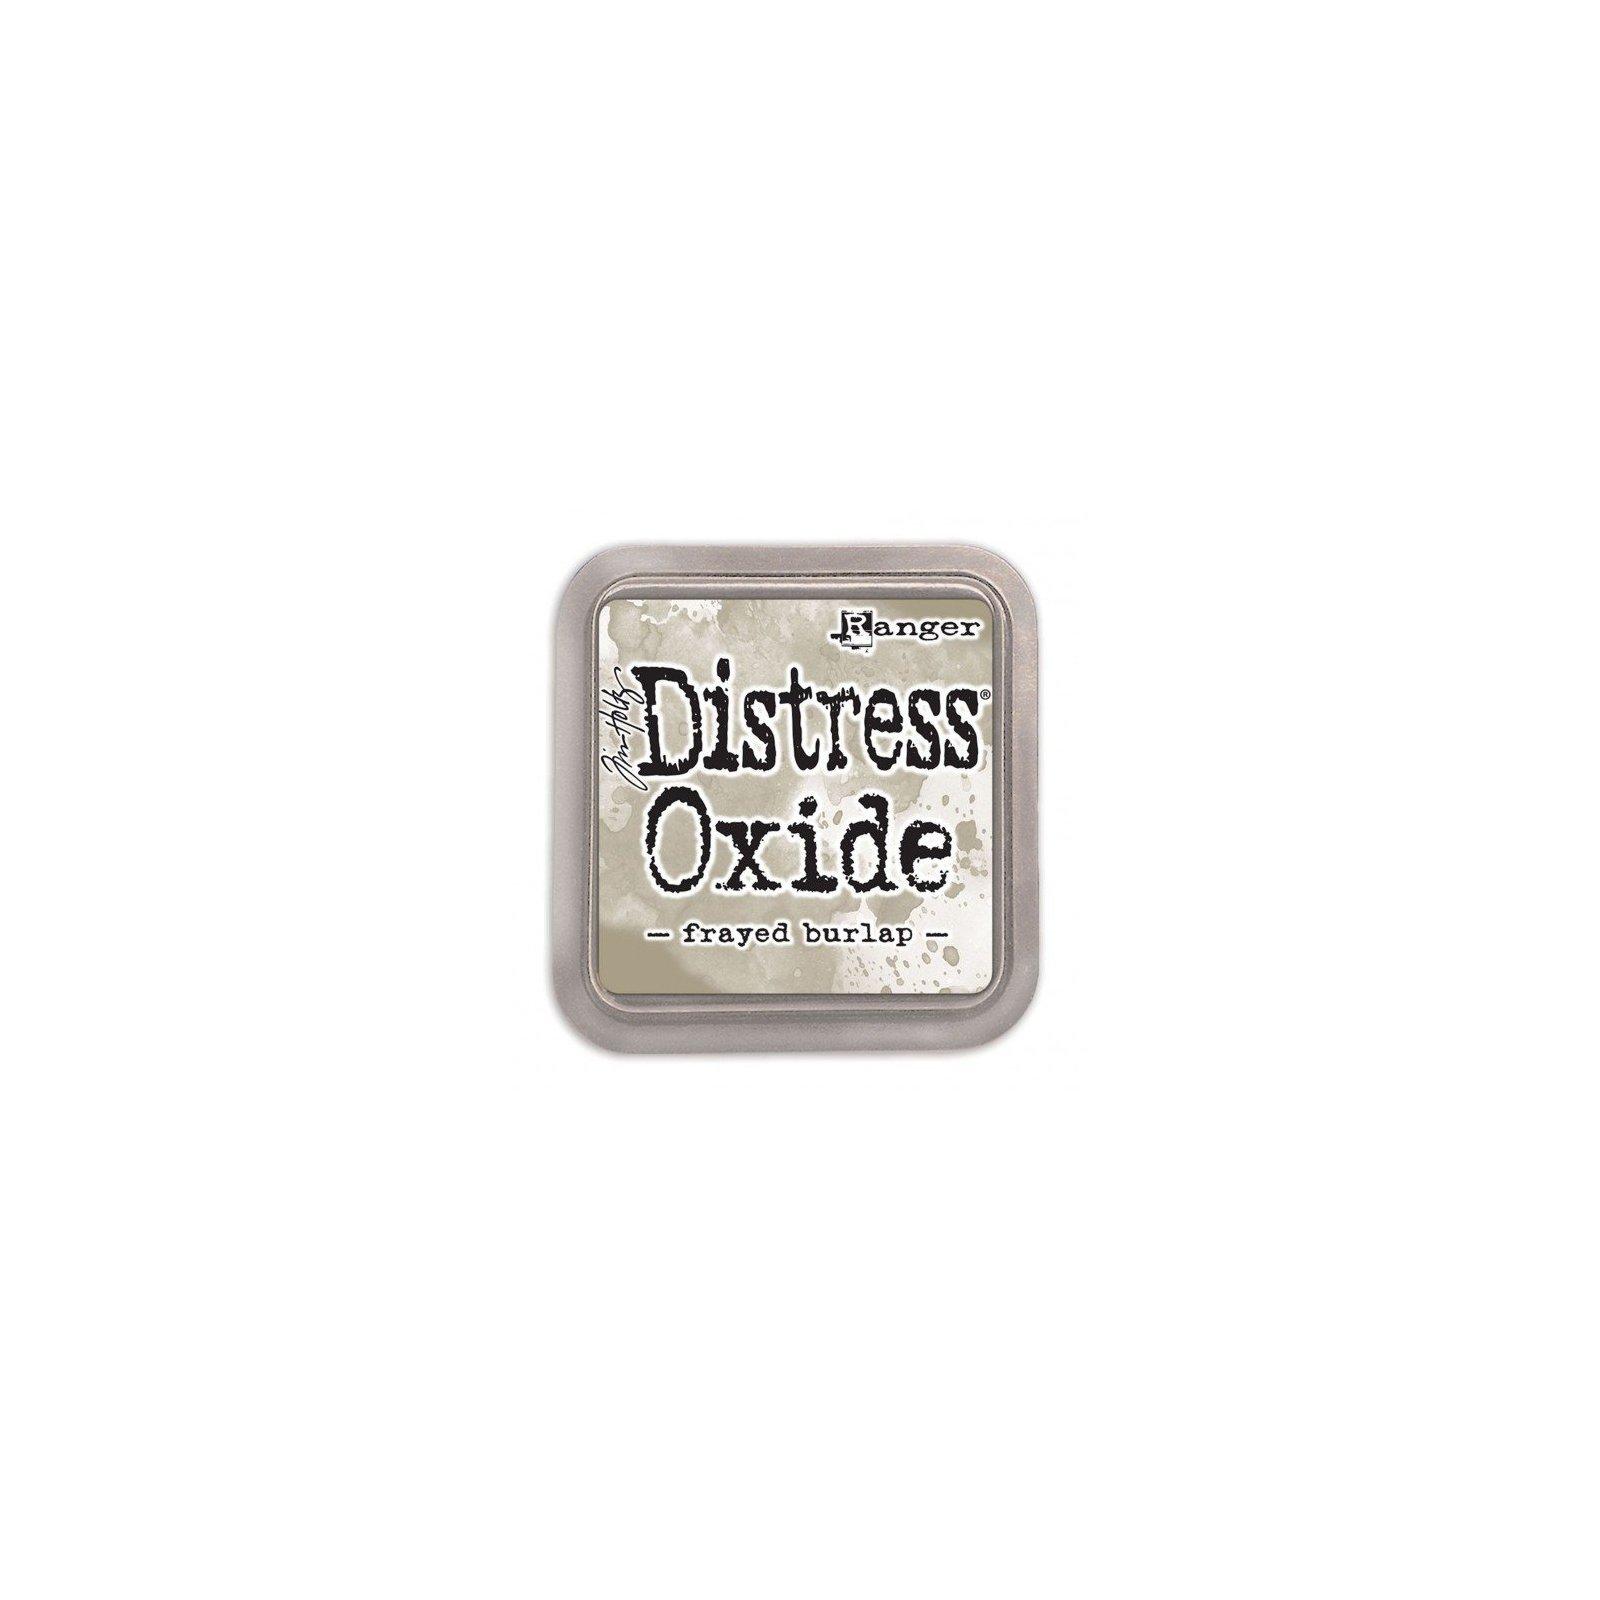 Grand encreur beige Distress Oxide - Frayed Burlap - Ranger